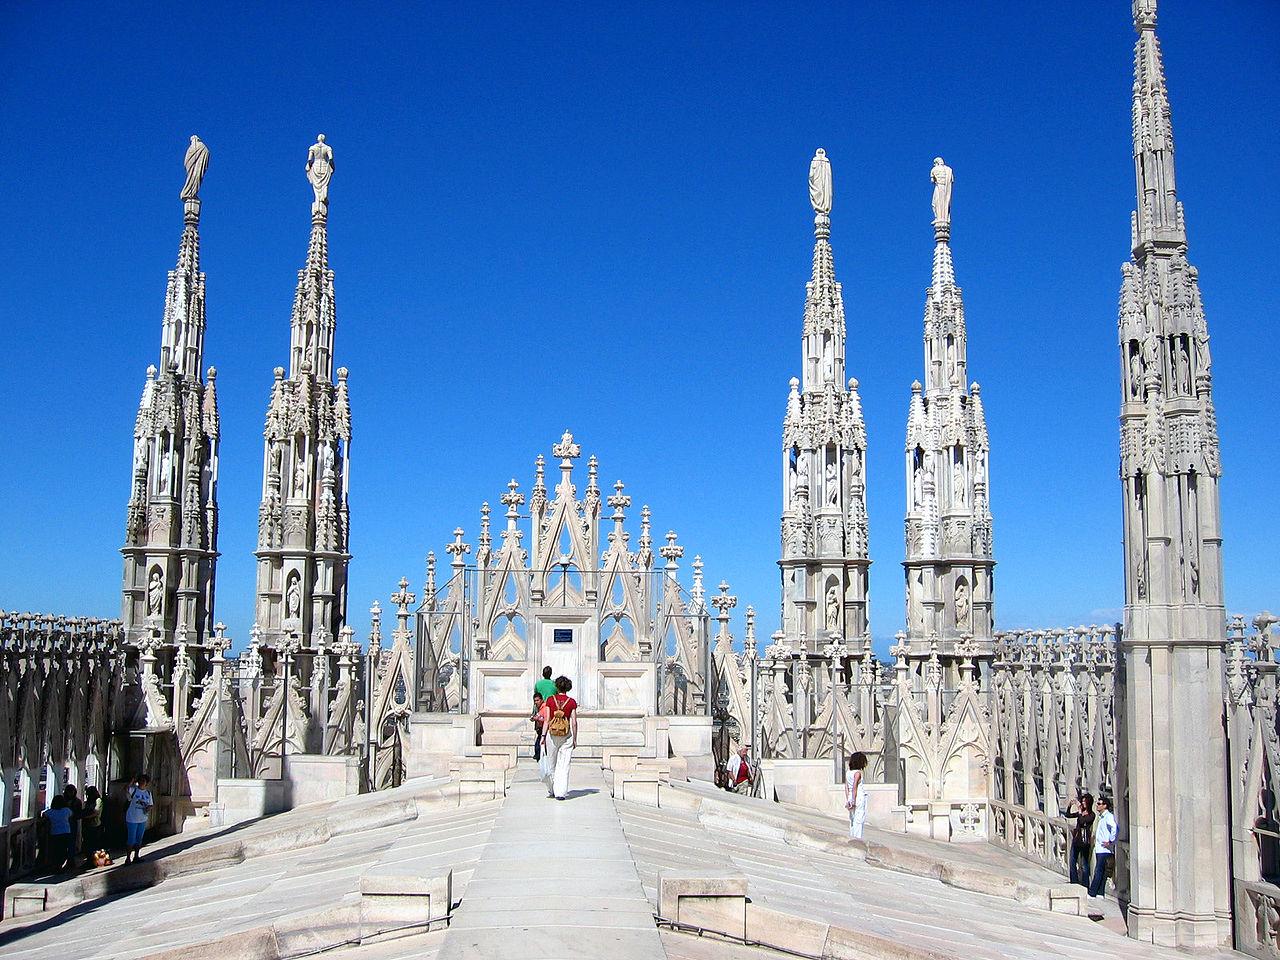 Миланский собор, на крыше